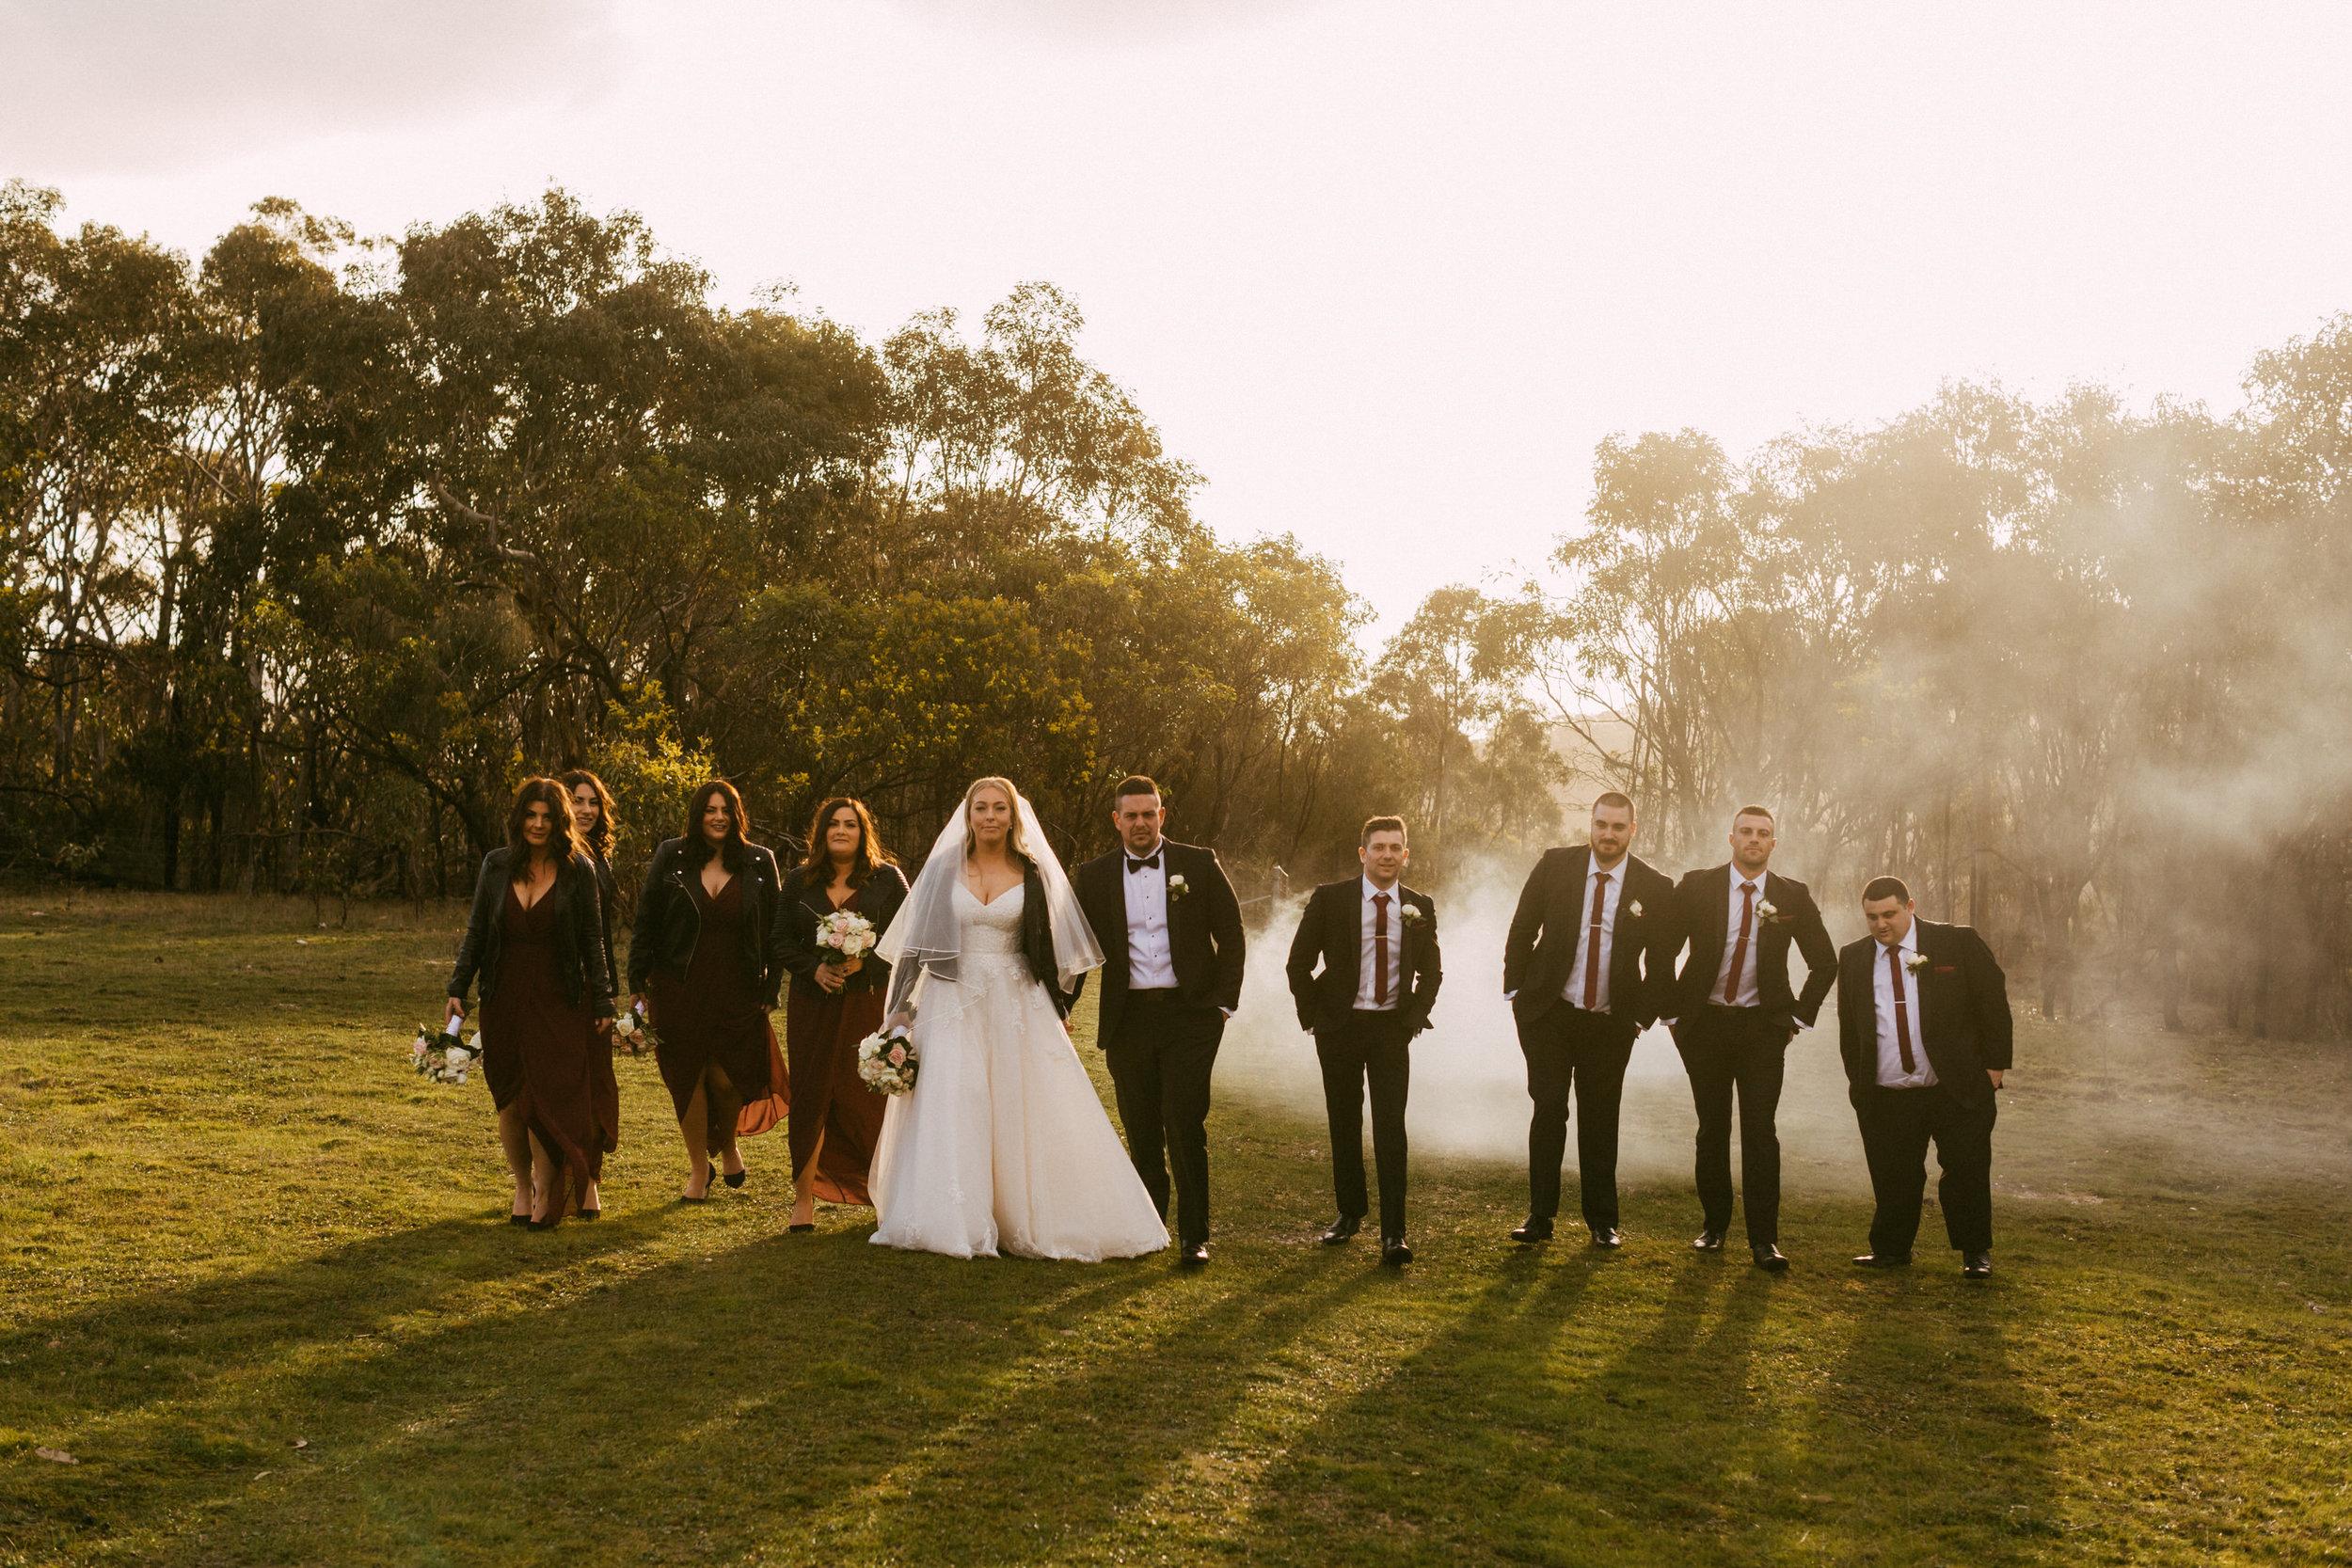 Adelaide Wedding Church Smoke Bomb Serafino 104.jpg